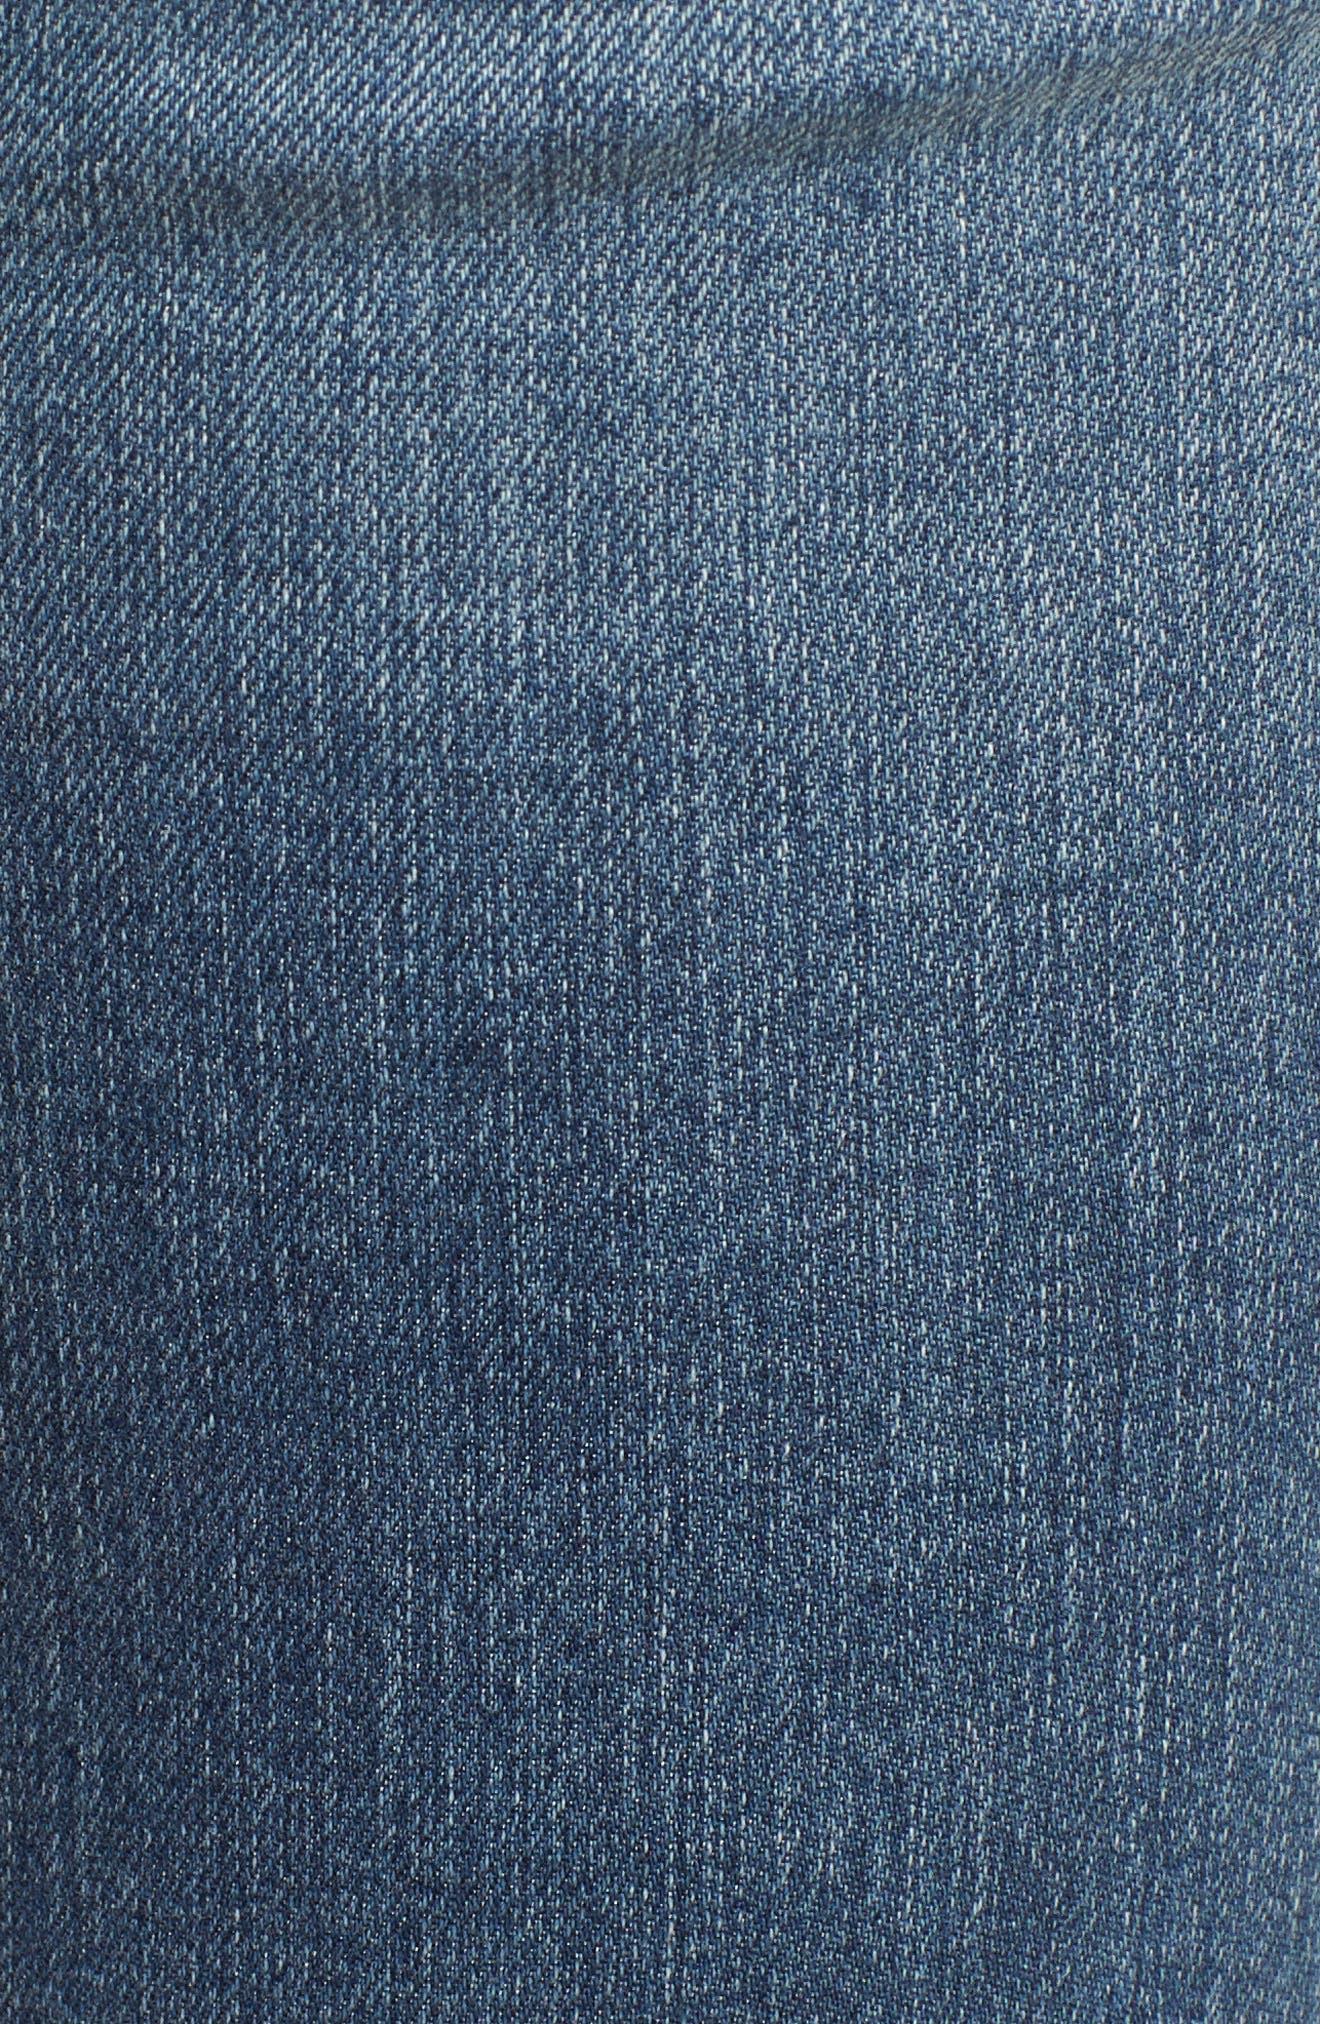 Sarah Skinny Jeans,                             Alternate thumbnail 6, color,                             400